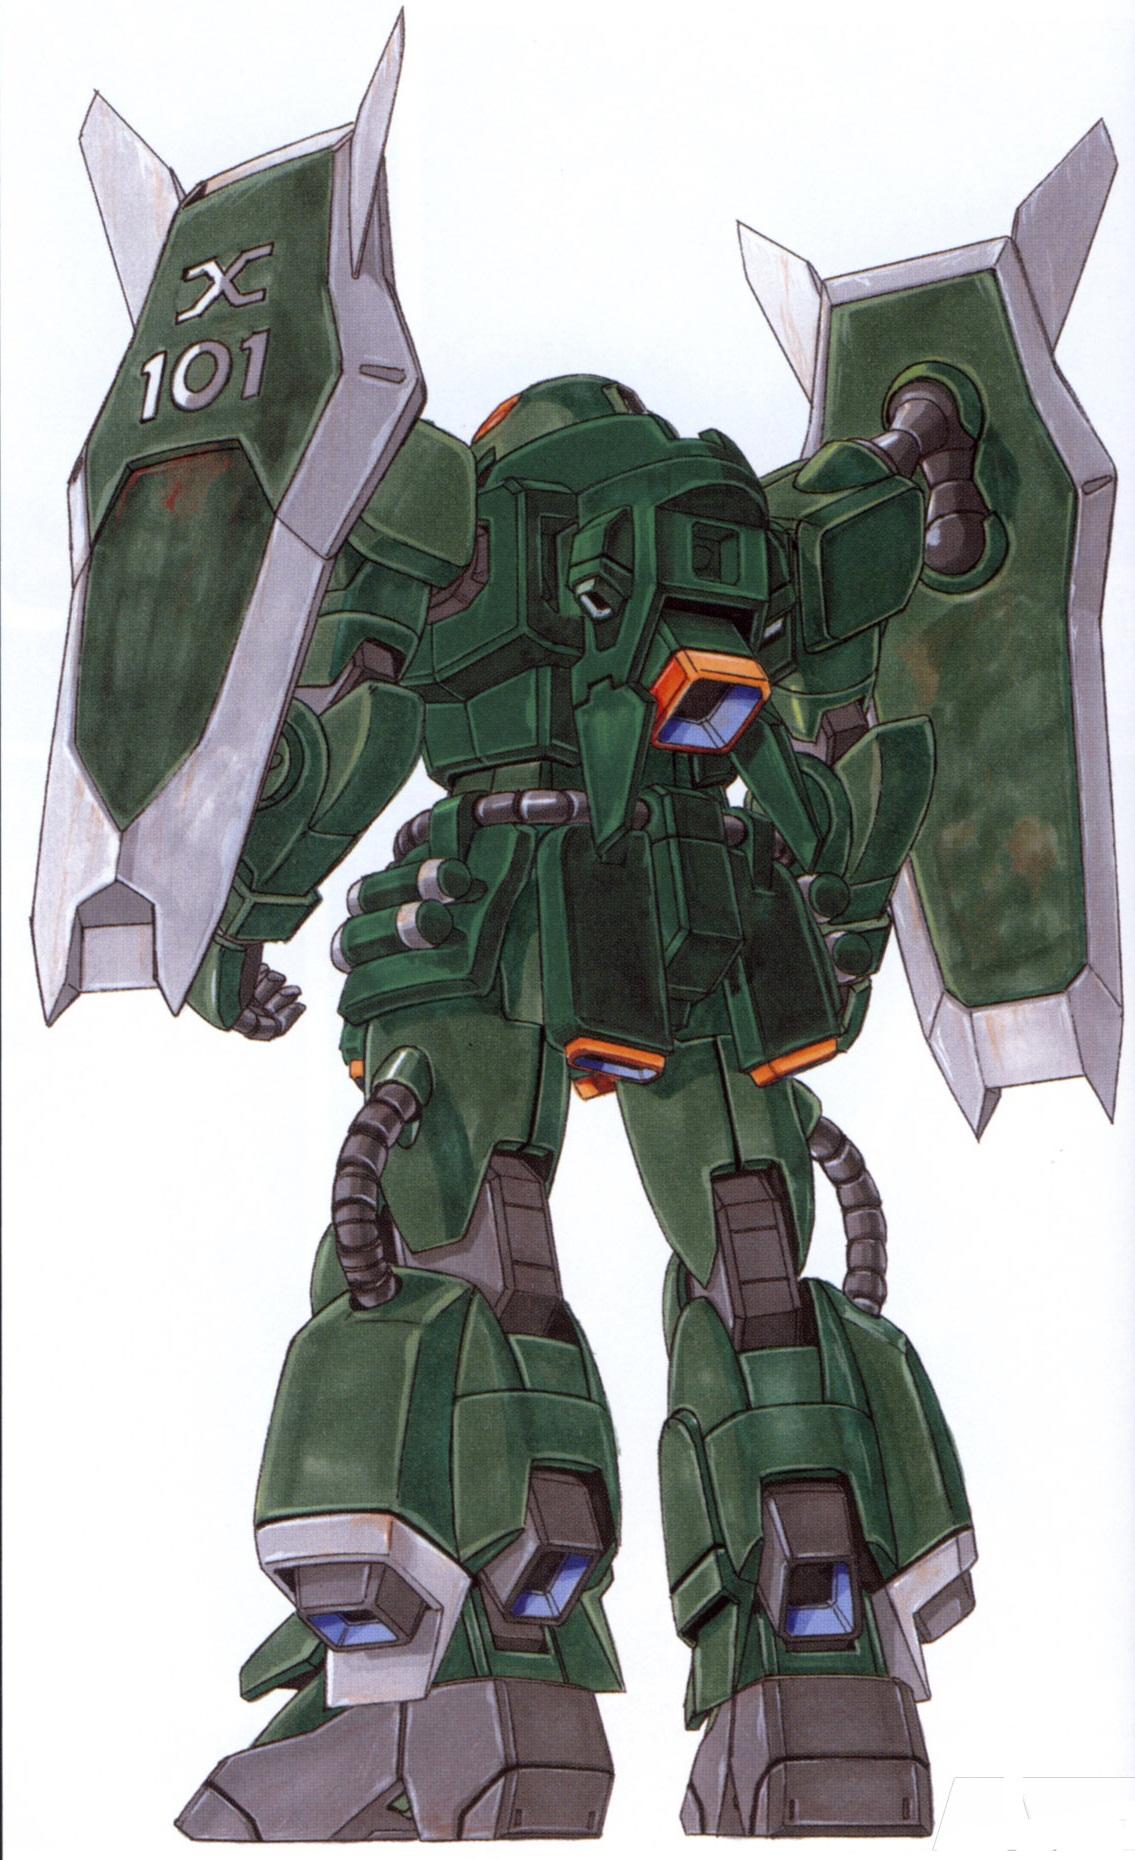 Zgmf X101s Zaku Splendor Gundam Wiki